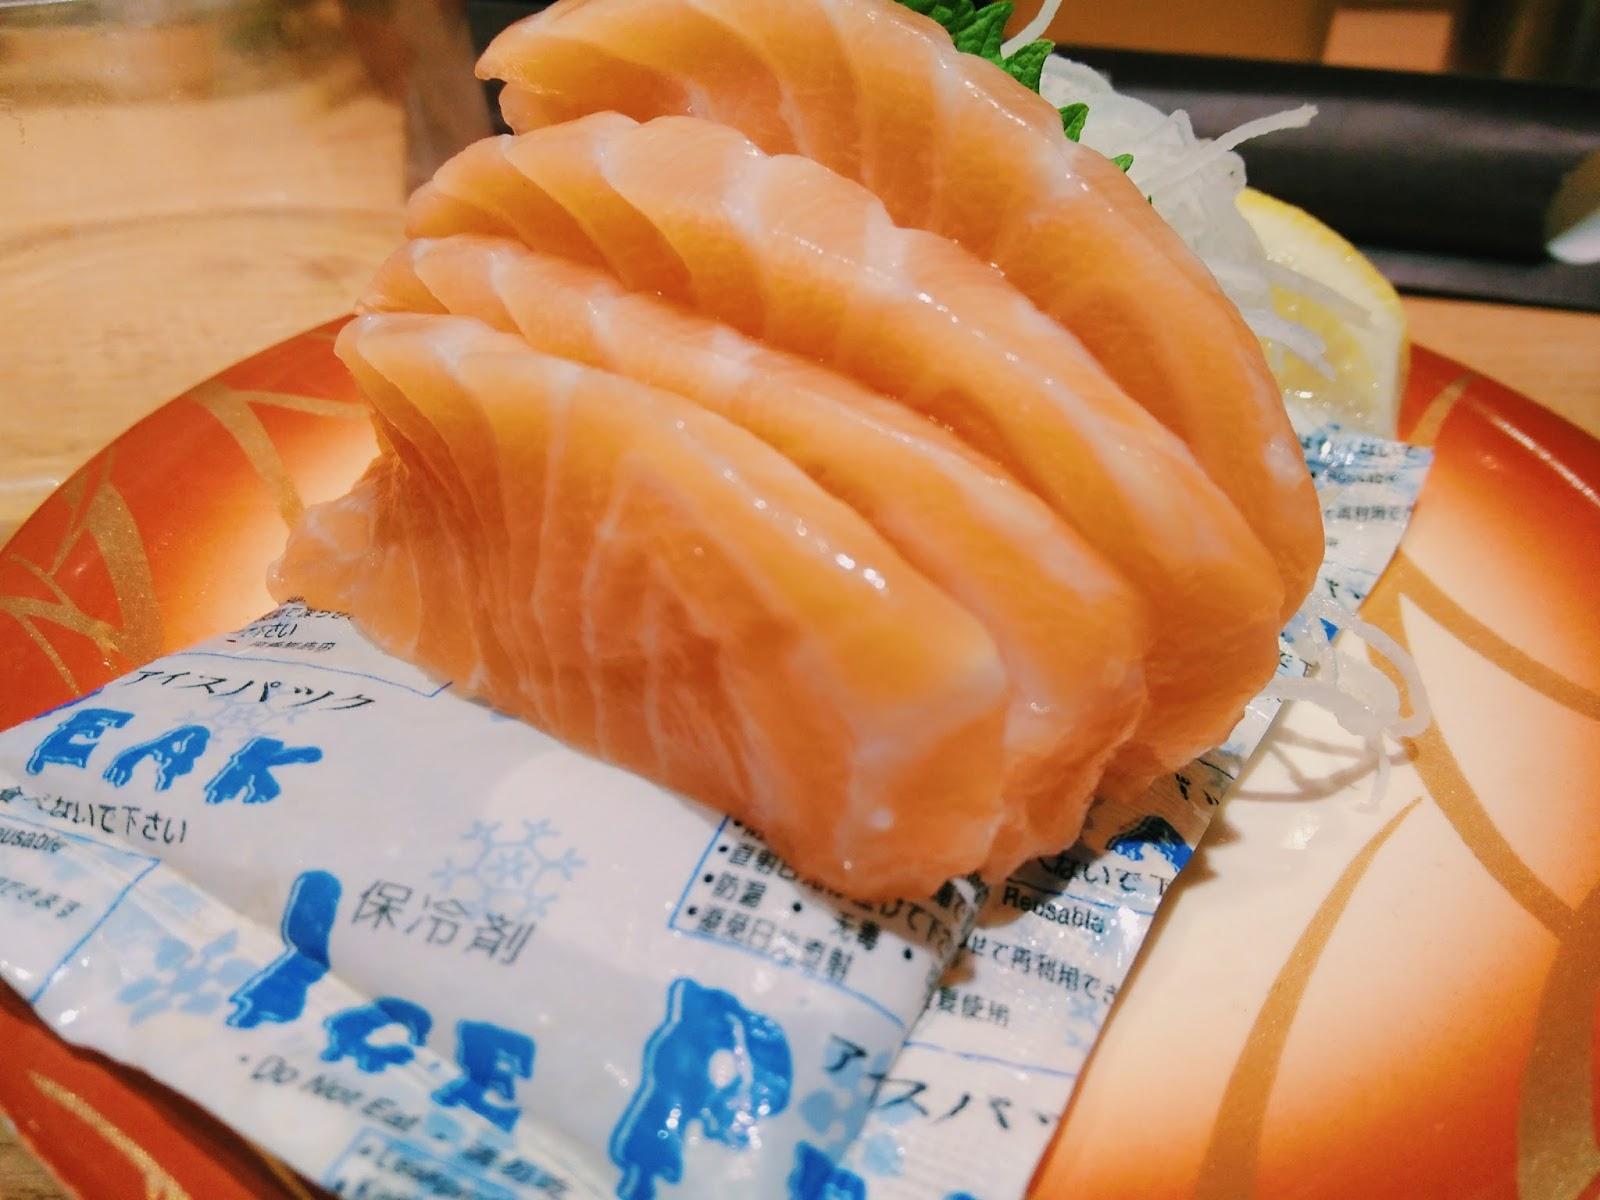 Allysa & Sushi : Sejarah Tak Perlu Berdarah - Sushi Tei